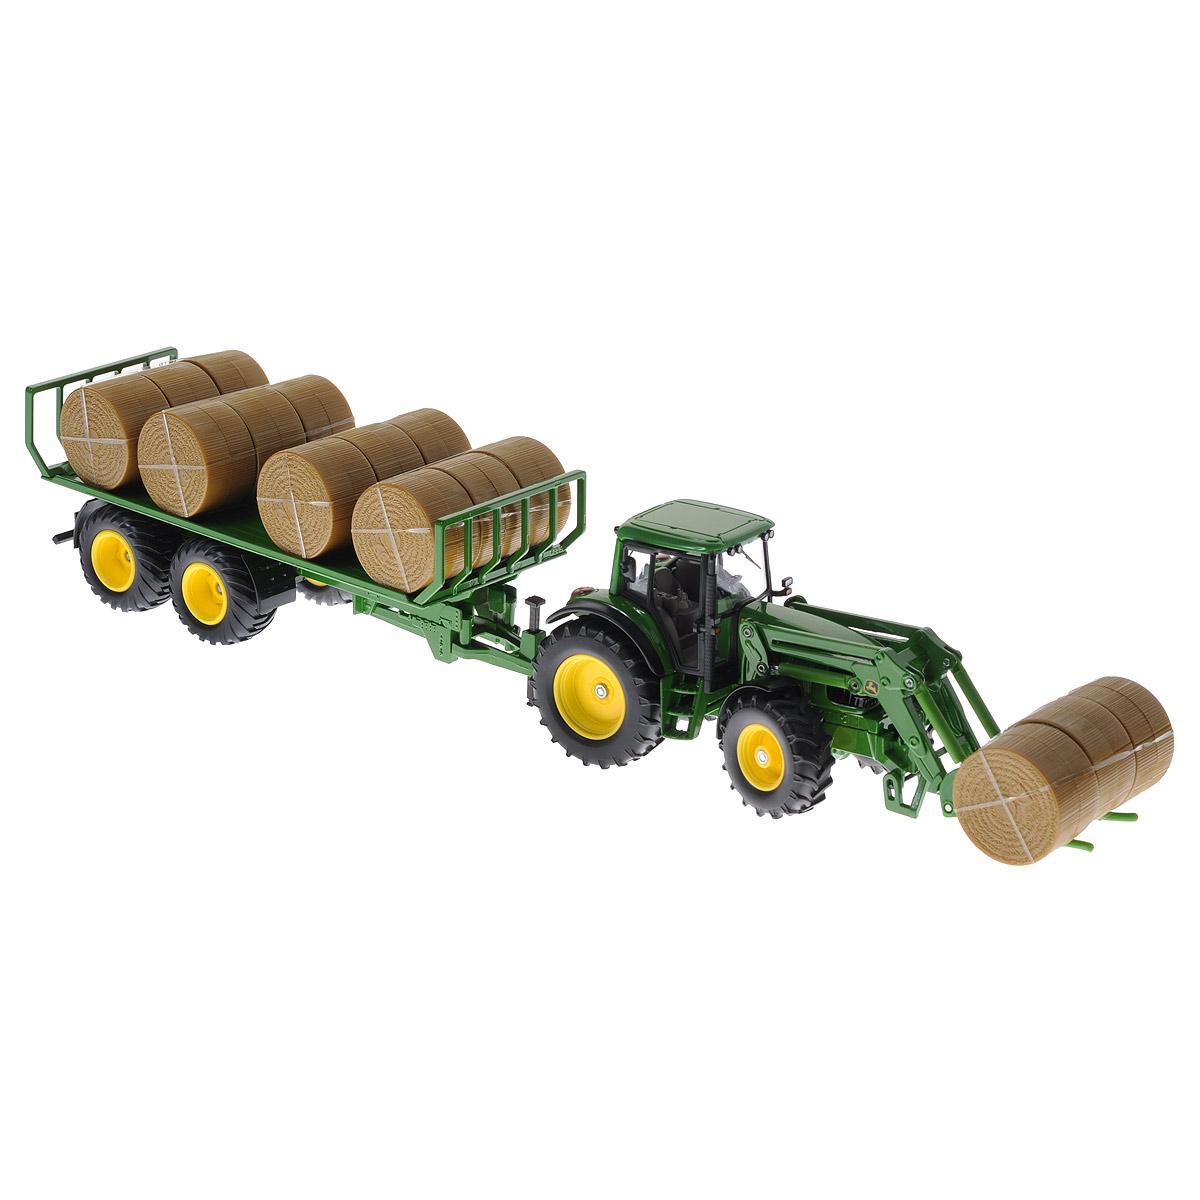 Siku Трактор John Deere с прицепом для круглых кип siku siku 1843 трактор john deere с ковшом прицепом 1 87